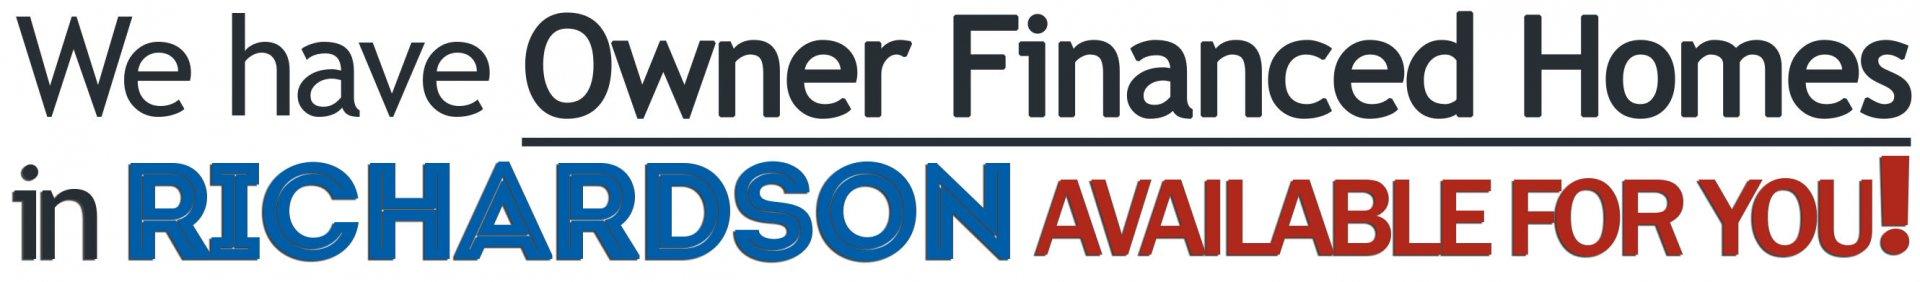 Owner Financed Homes in Richardson - Owner Finance Dallas